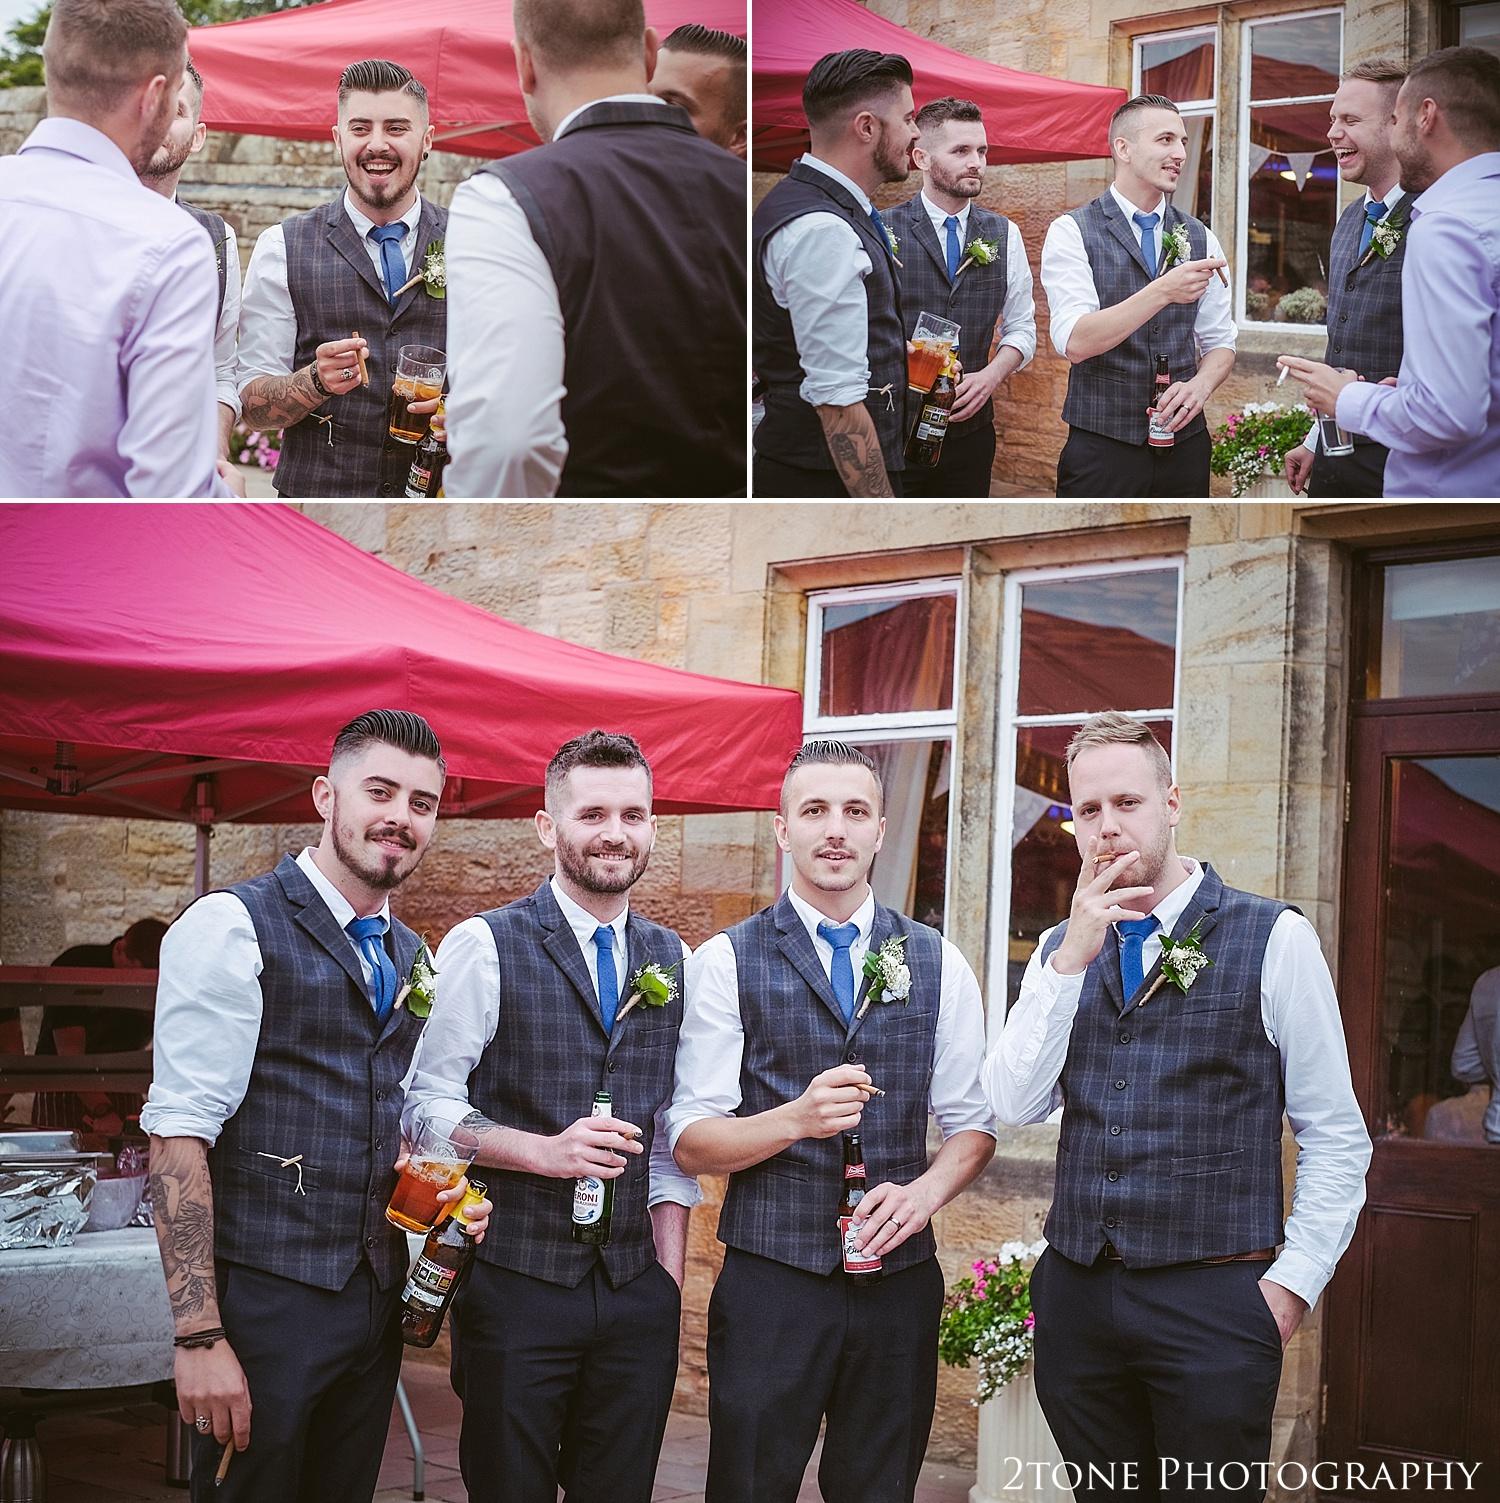 The groomsmen with cigars.  Wedding photography at Guyzance Hall by wedding photographers www.2tonephotography.co.uk